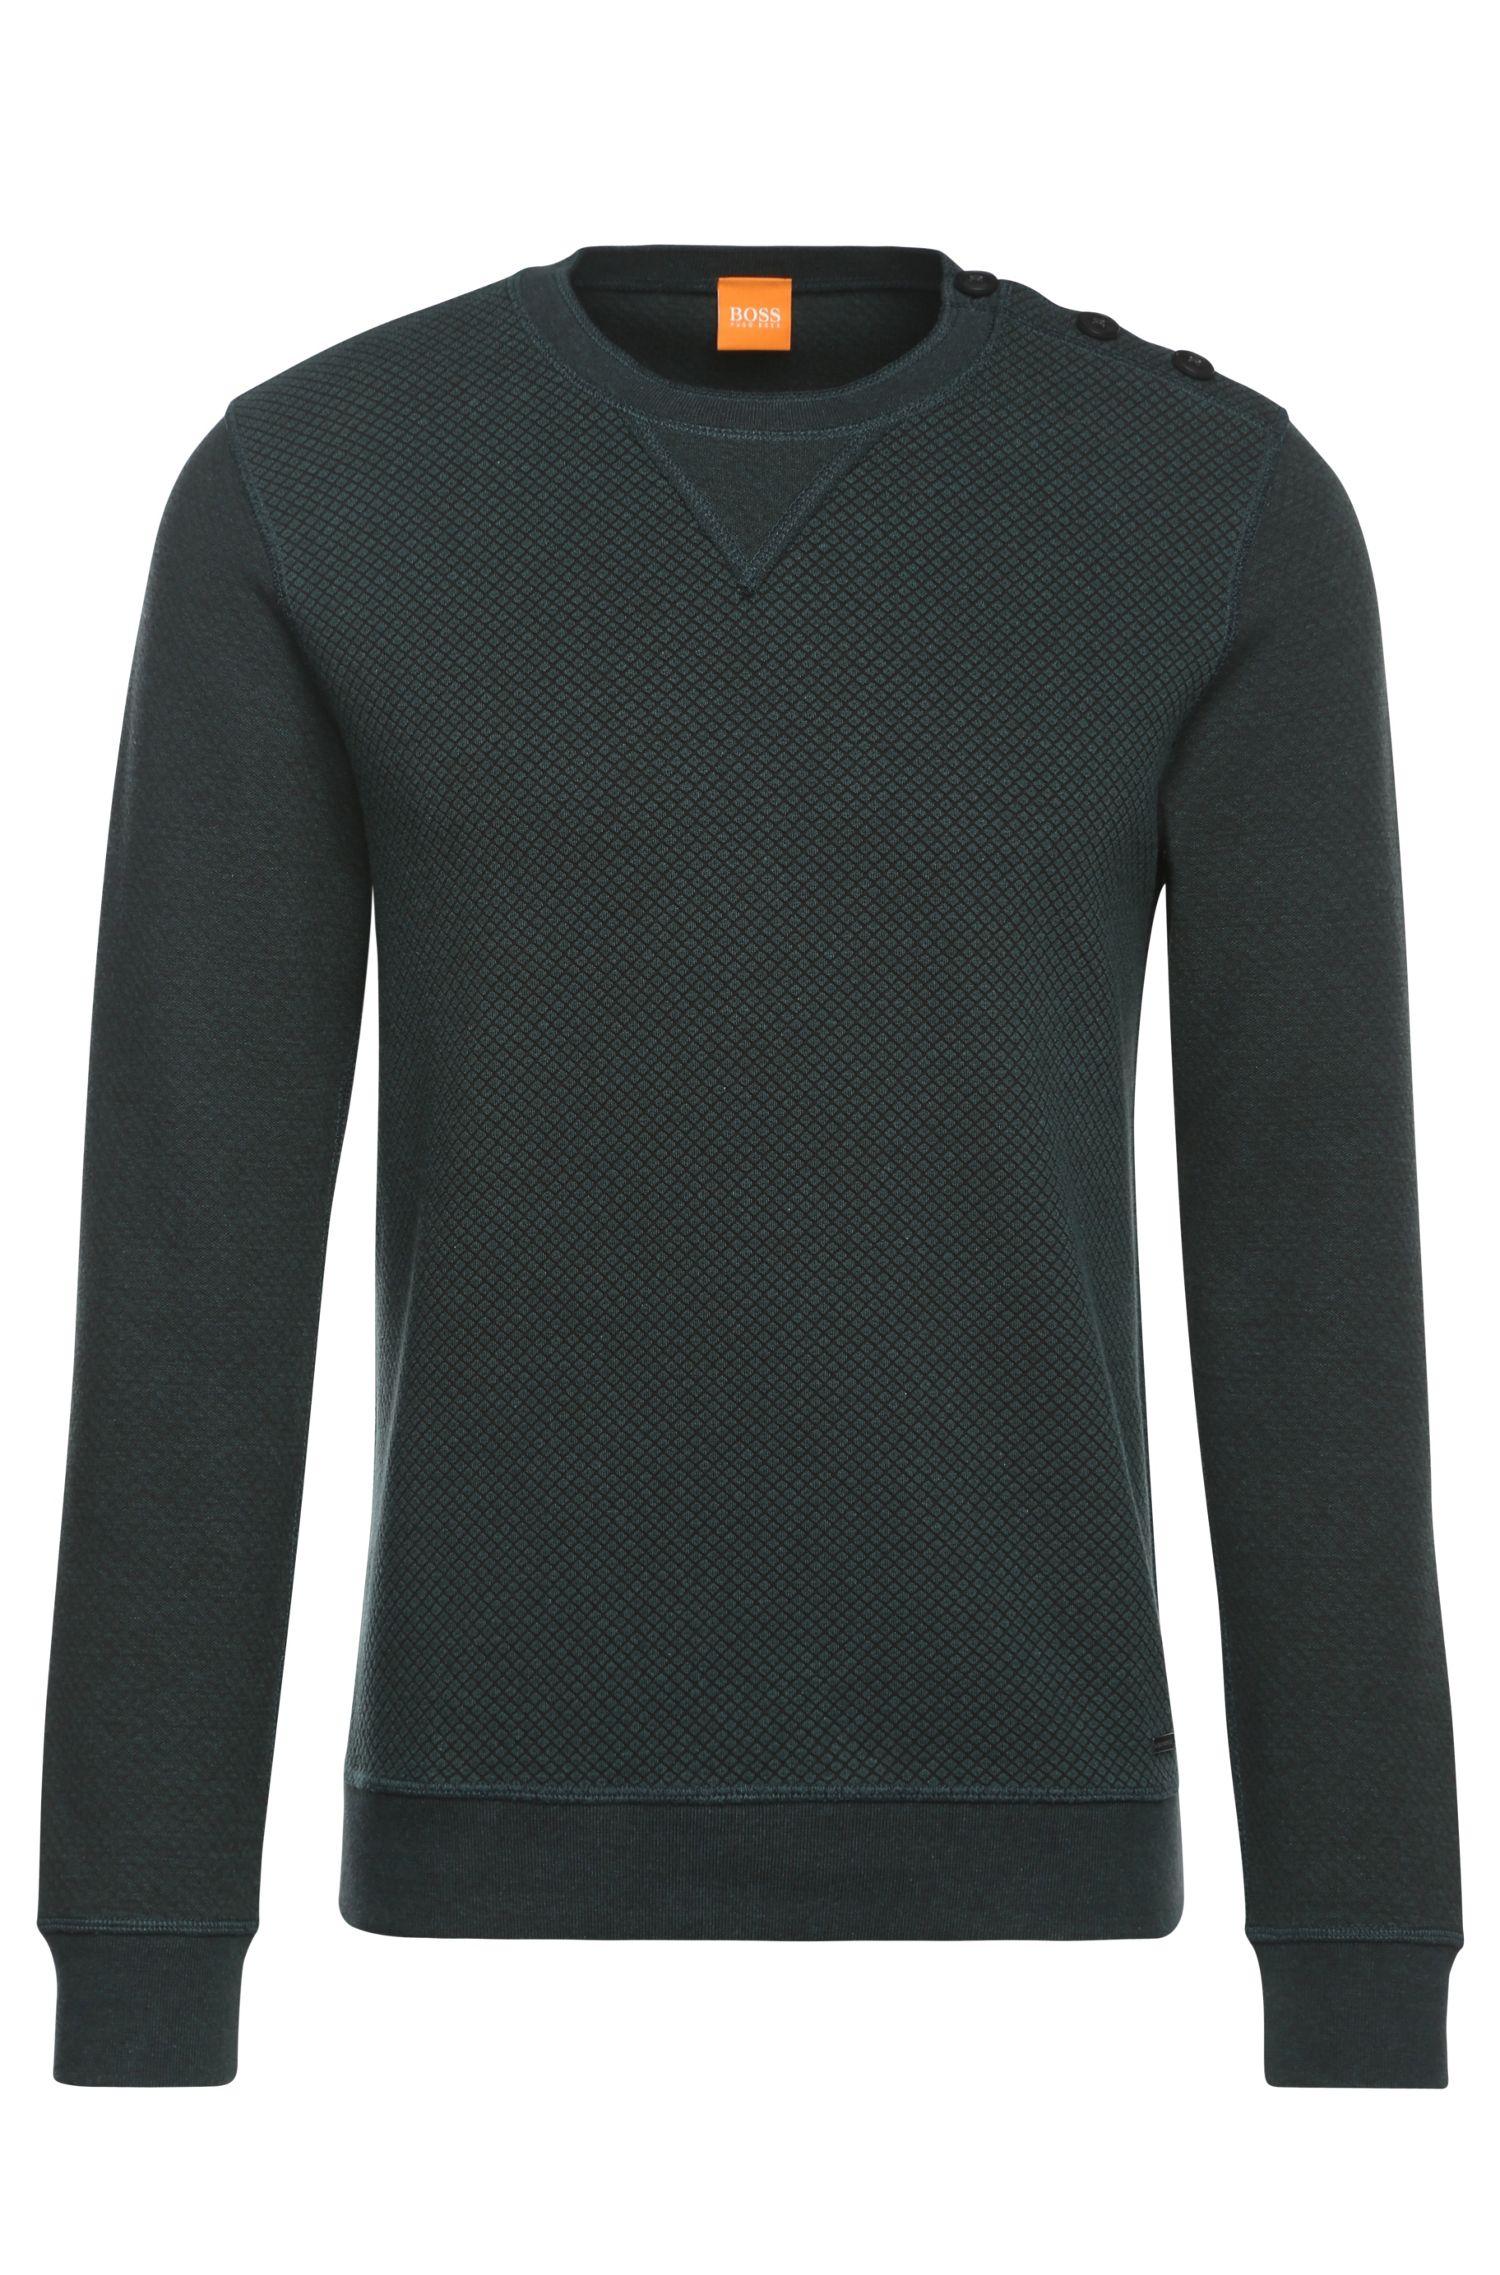 'Who' | Stretch Cotton Blend Jacquard Sweatshirt